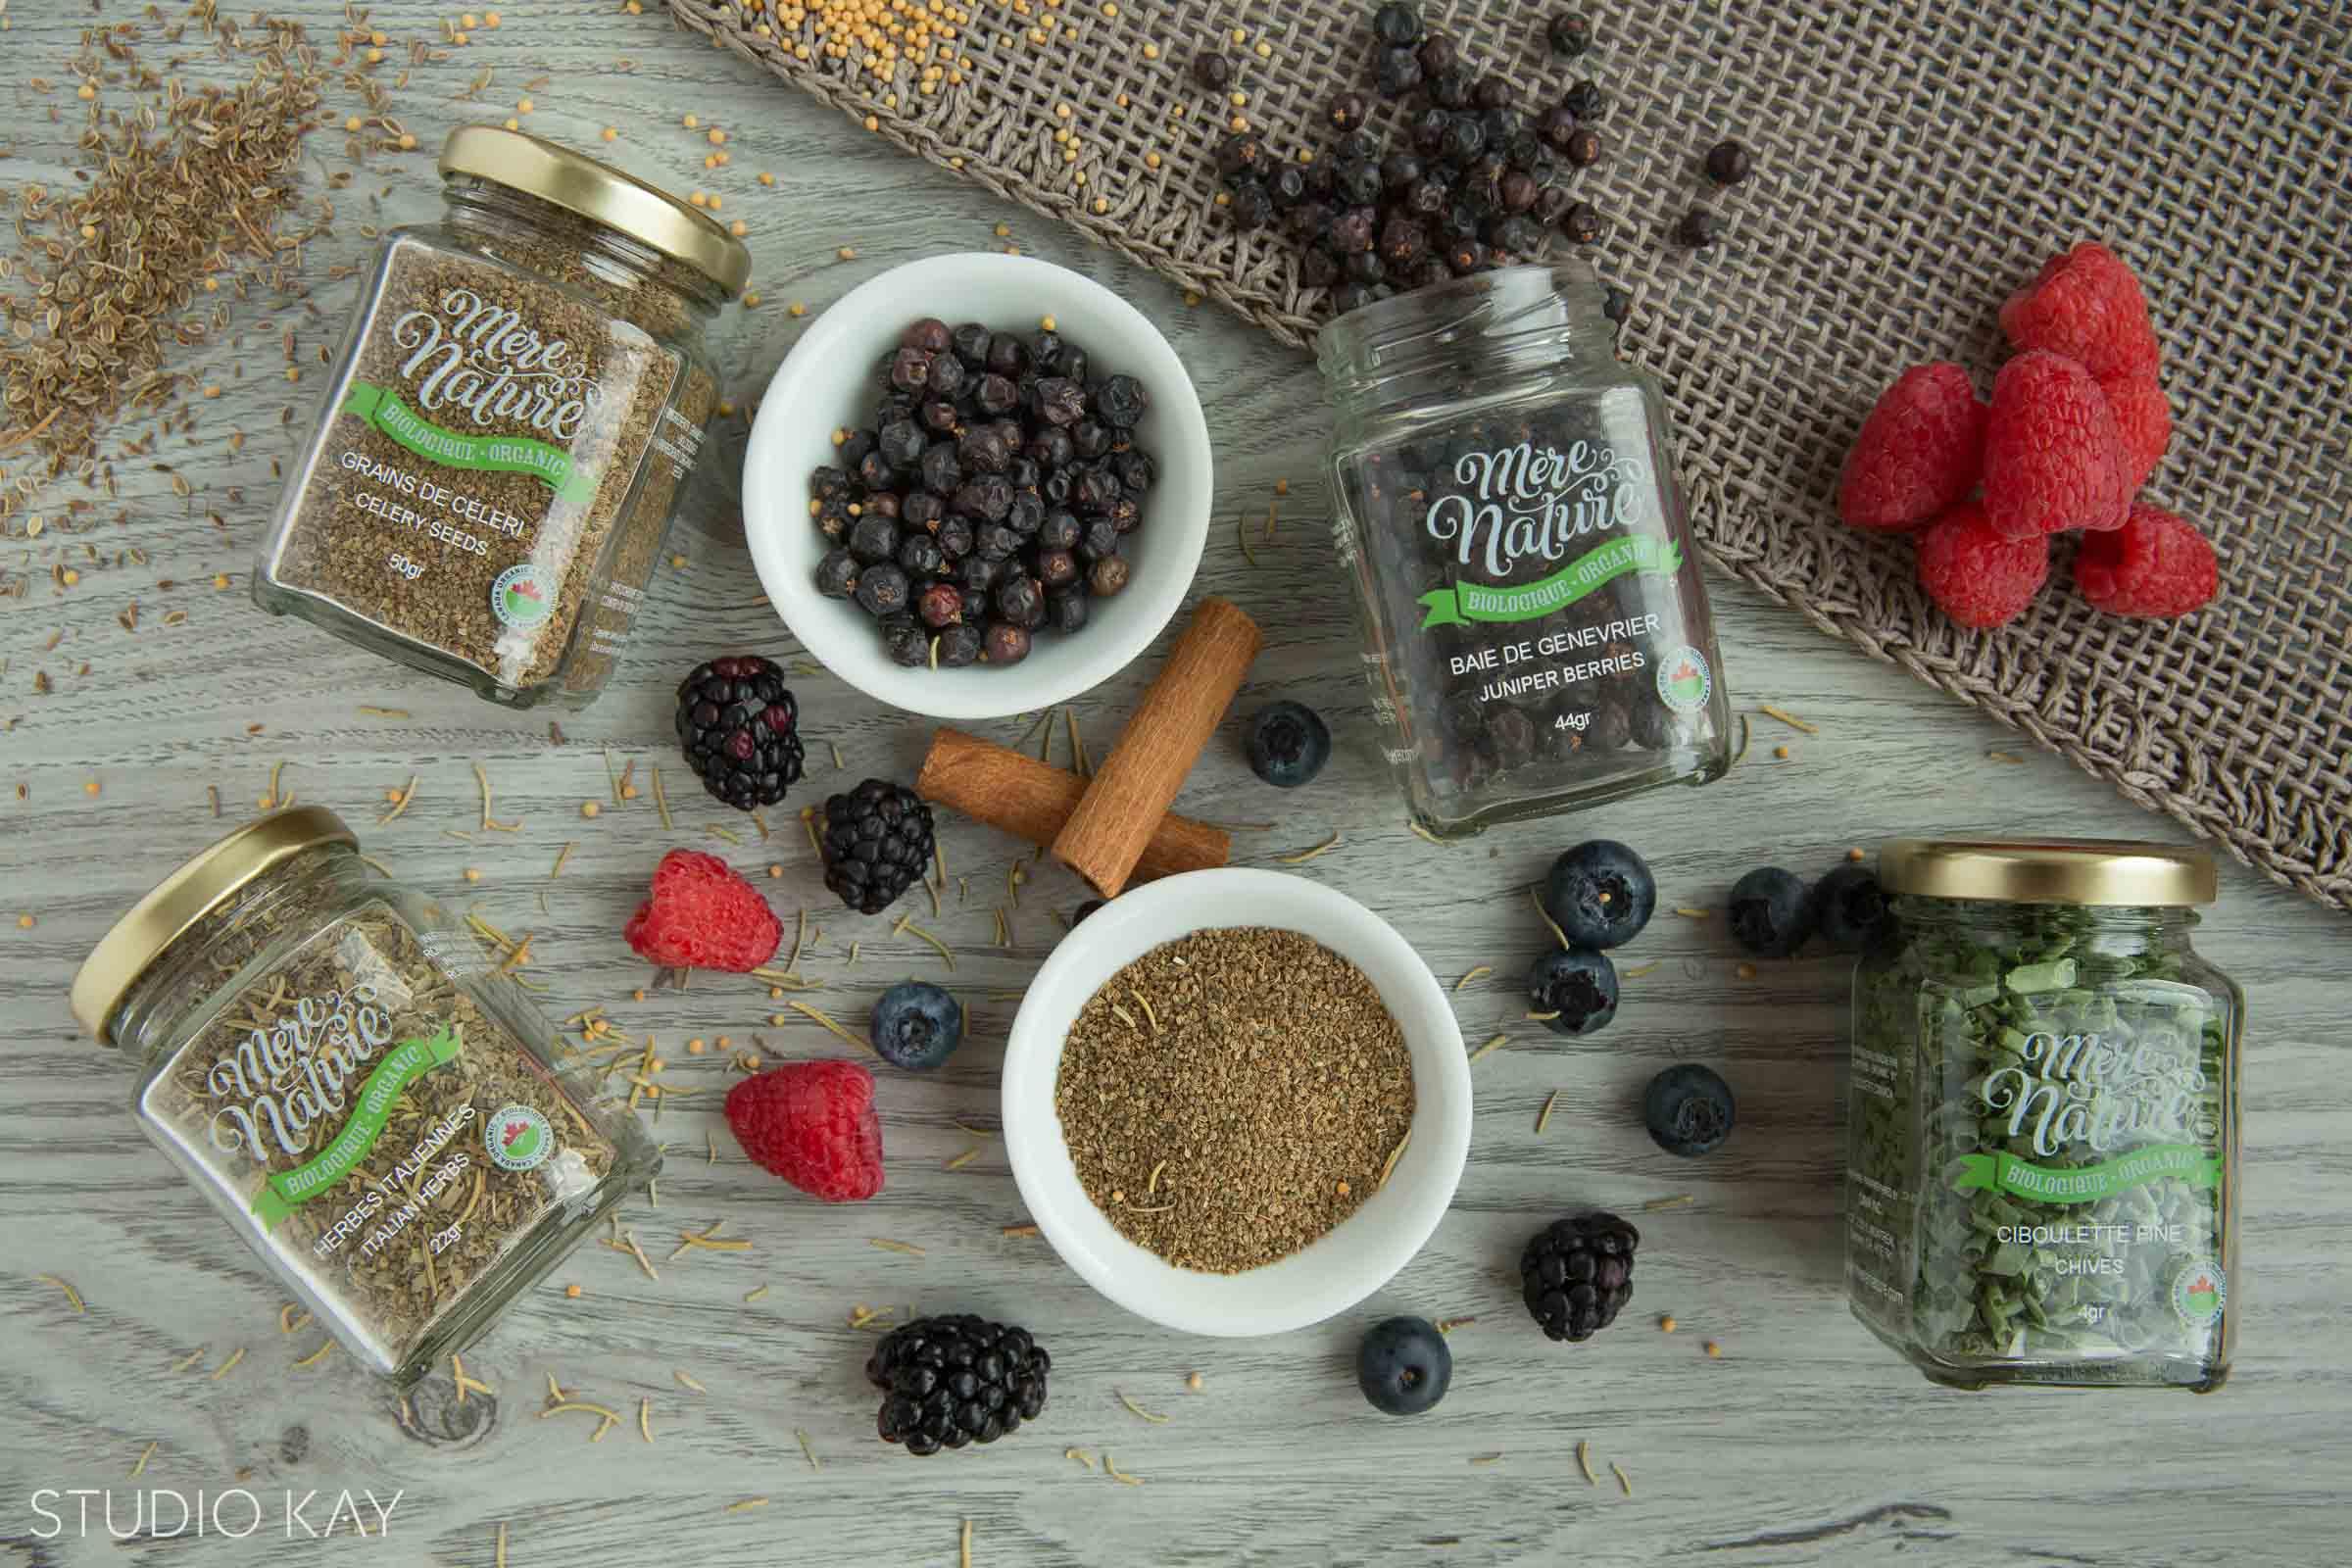 Studio Kay-Product food photographer